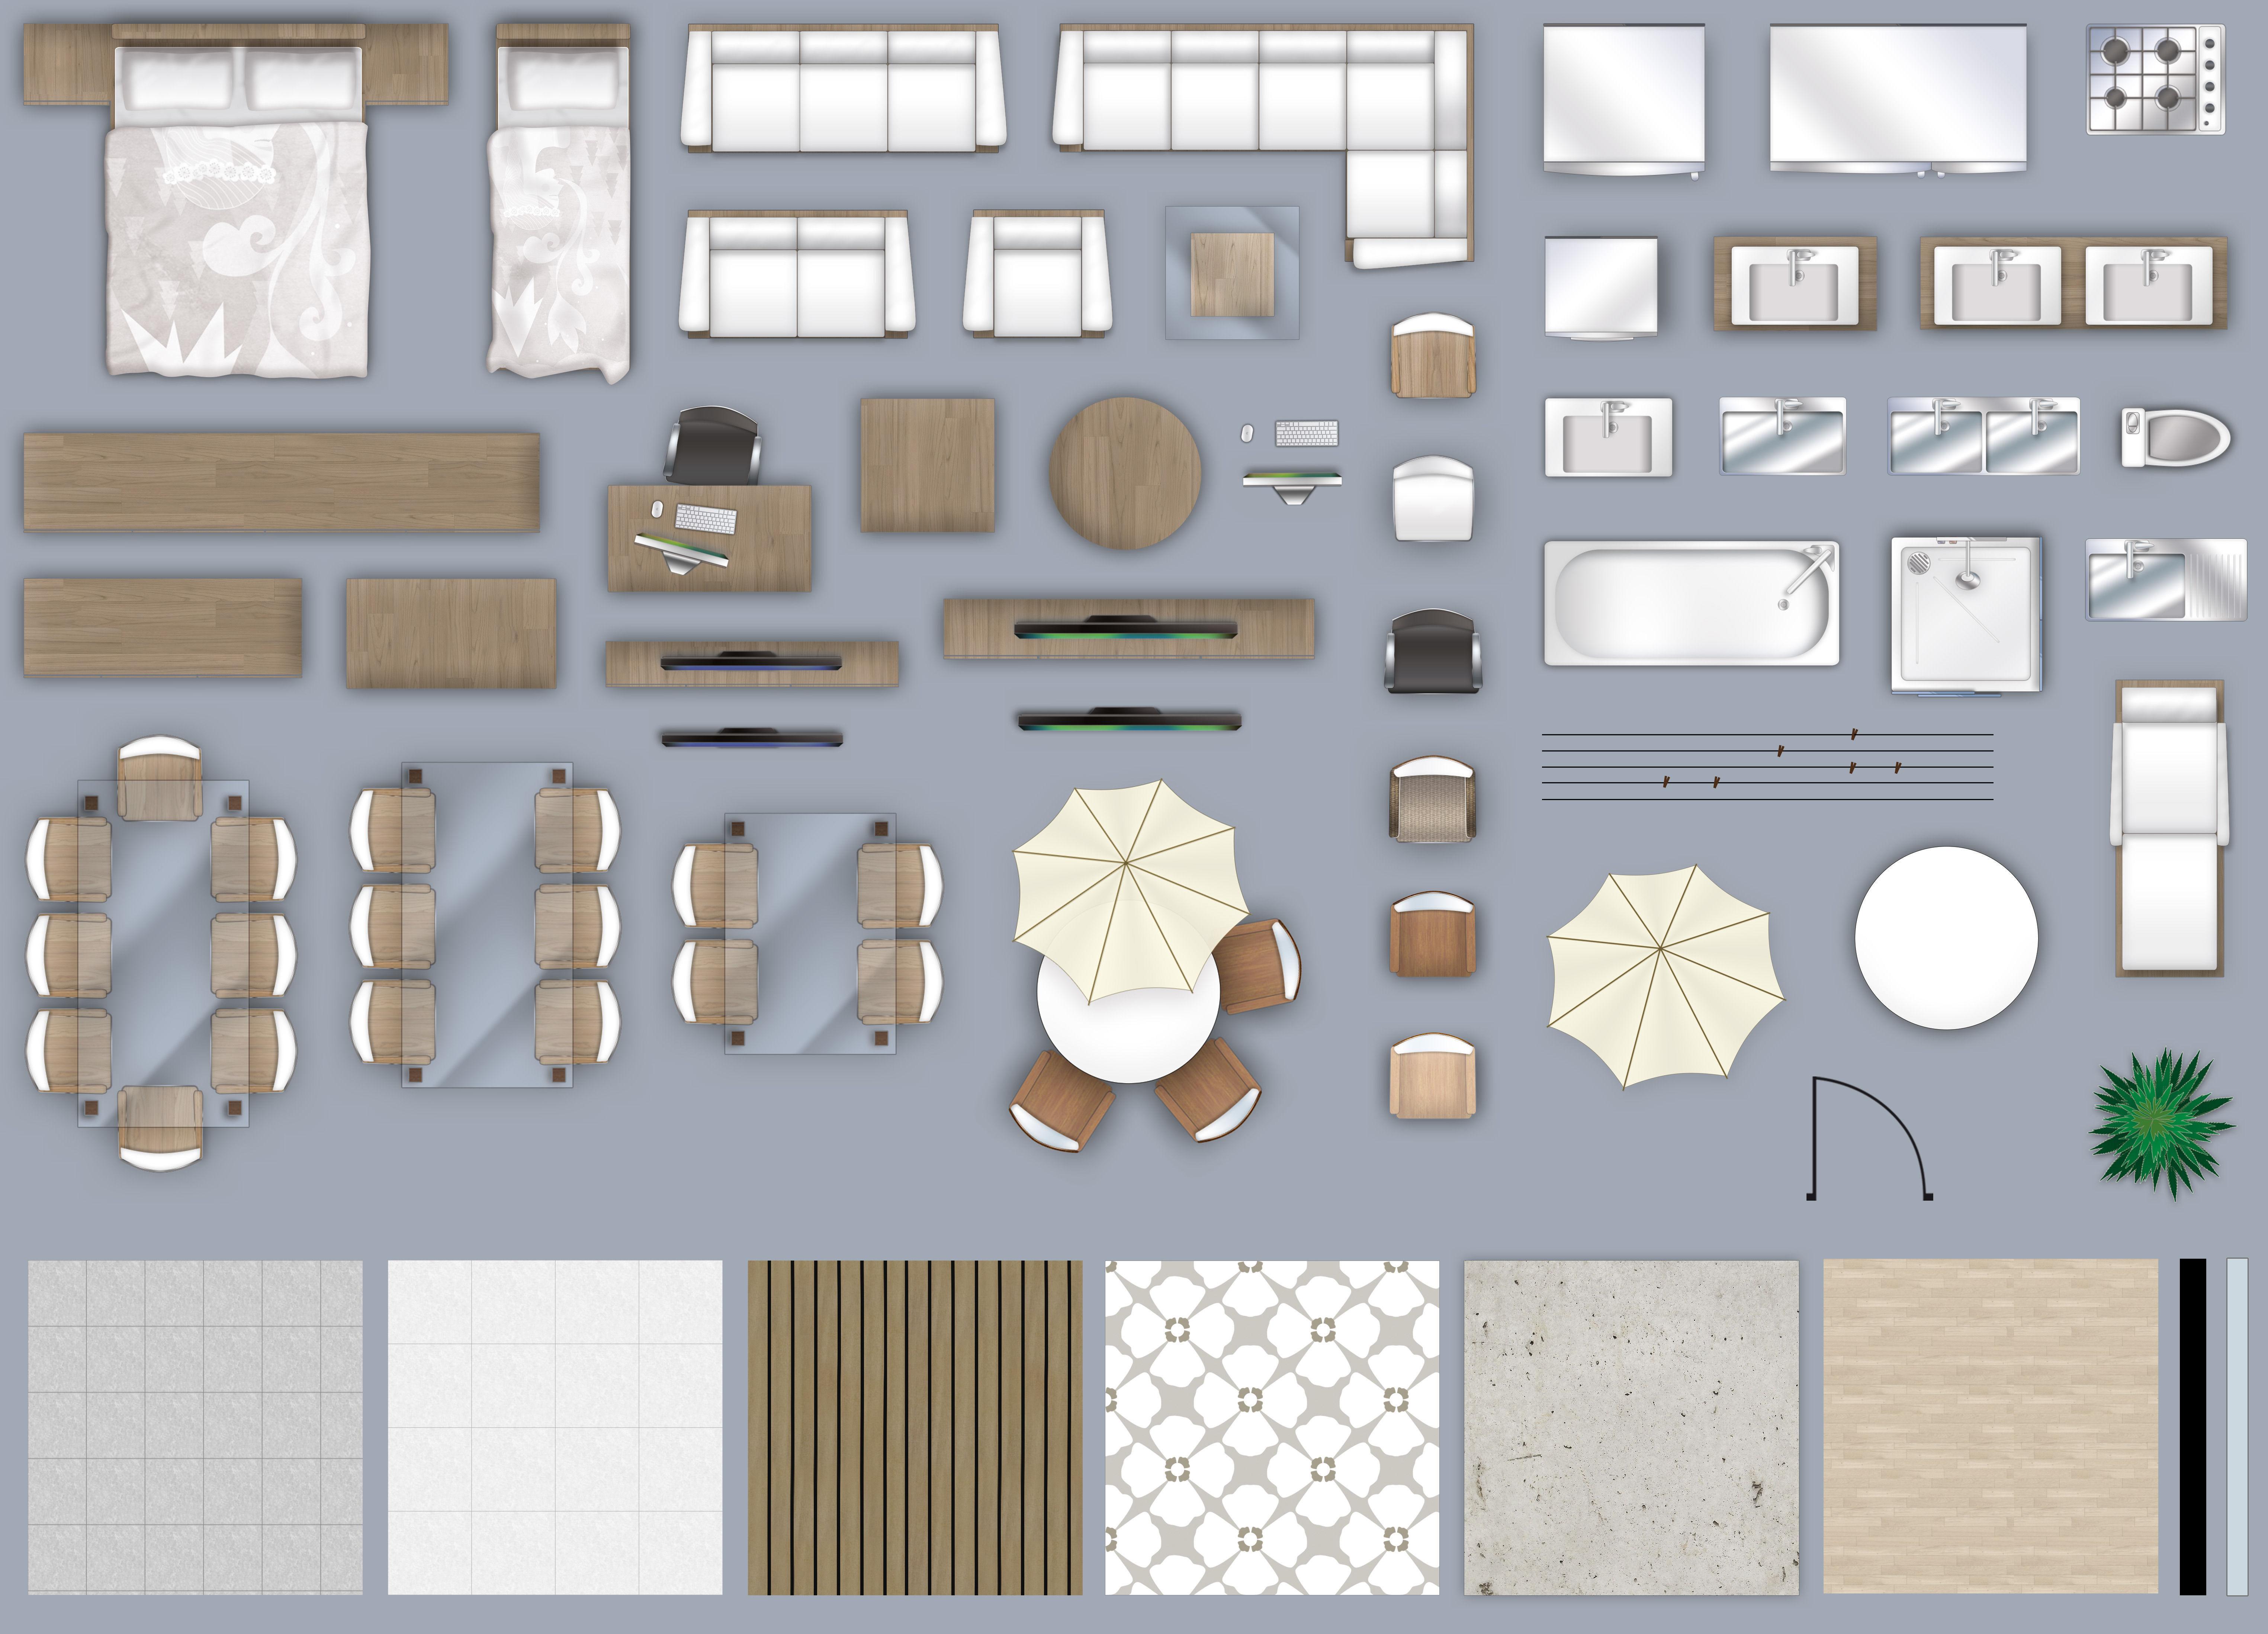 2d furniture floorplan top down view PSD.